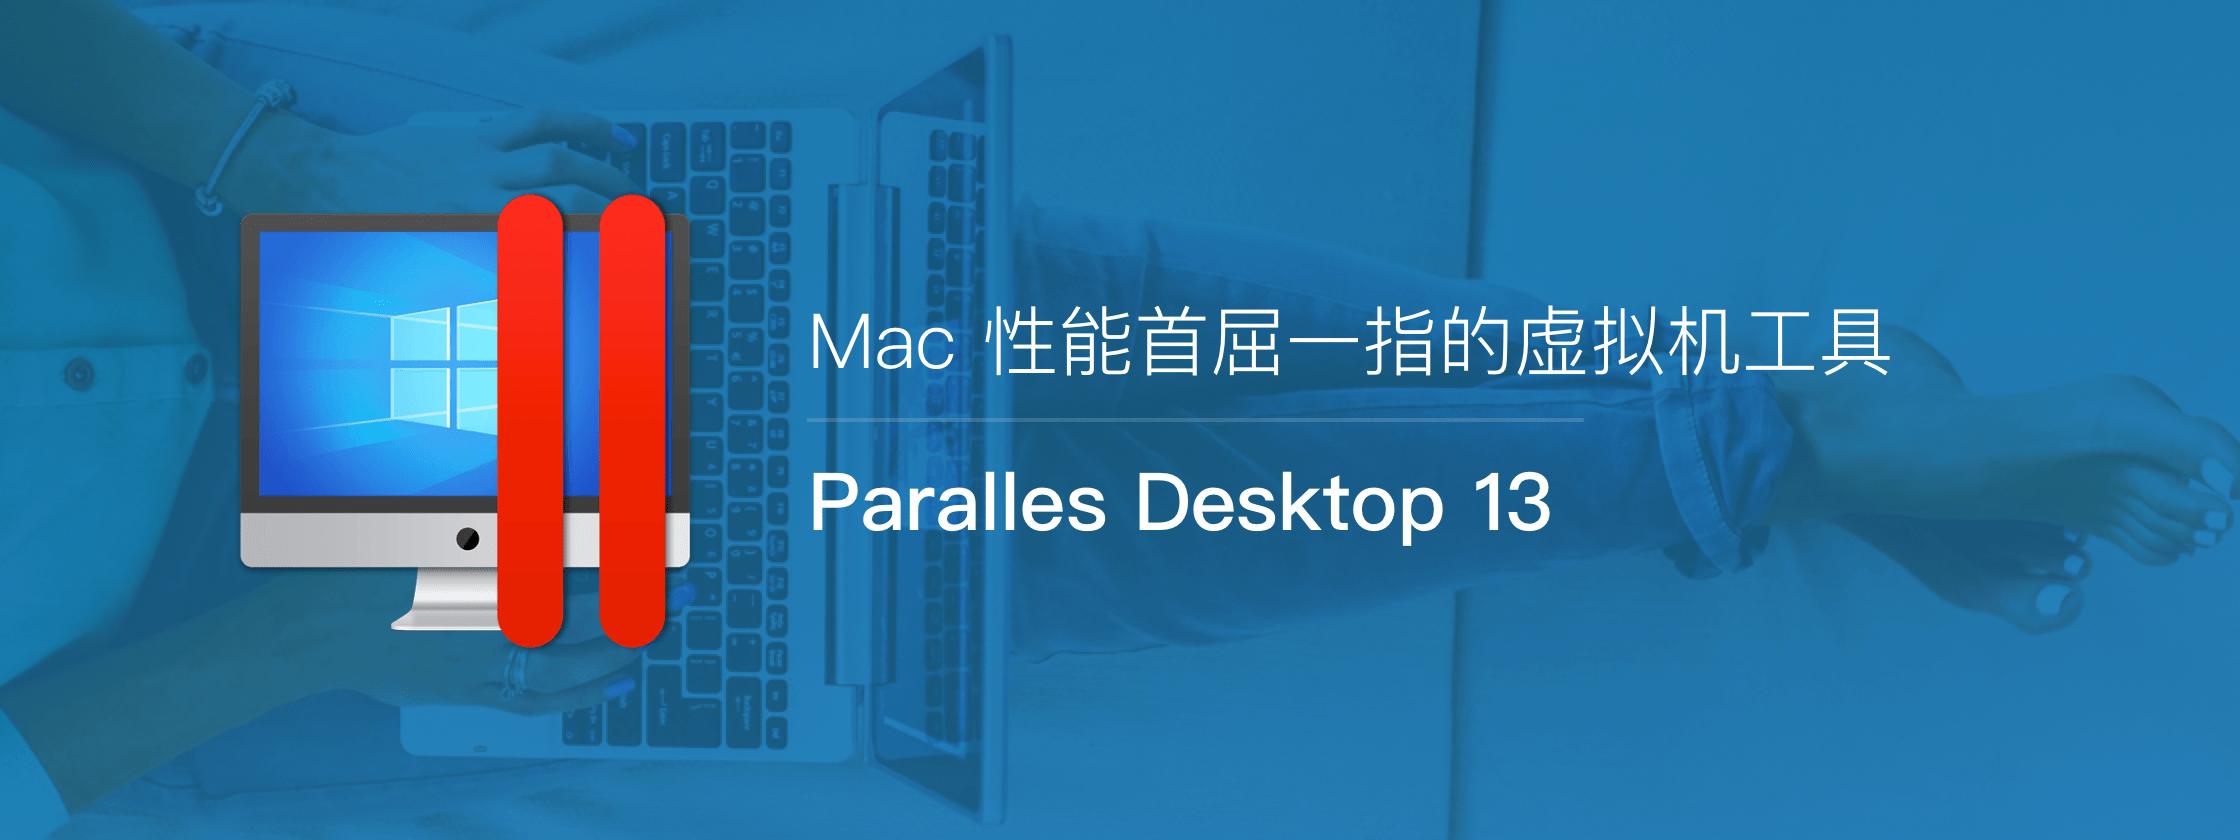 Parallels Desktop 13,Mac 上性能首屈一指的虚拟机